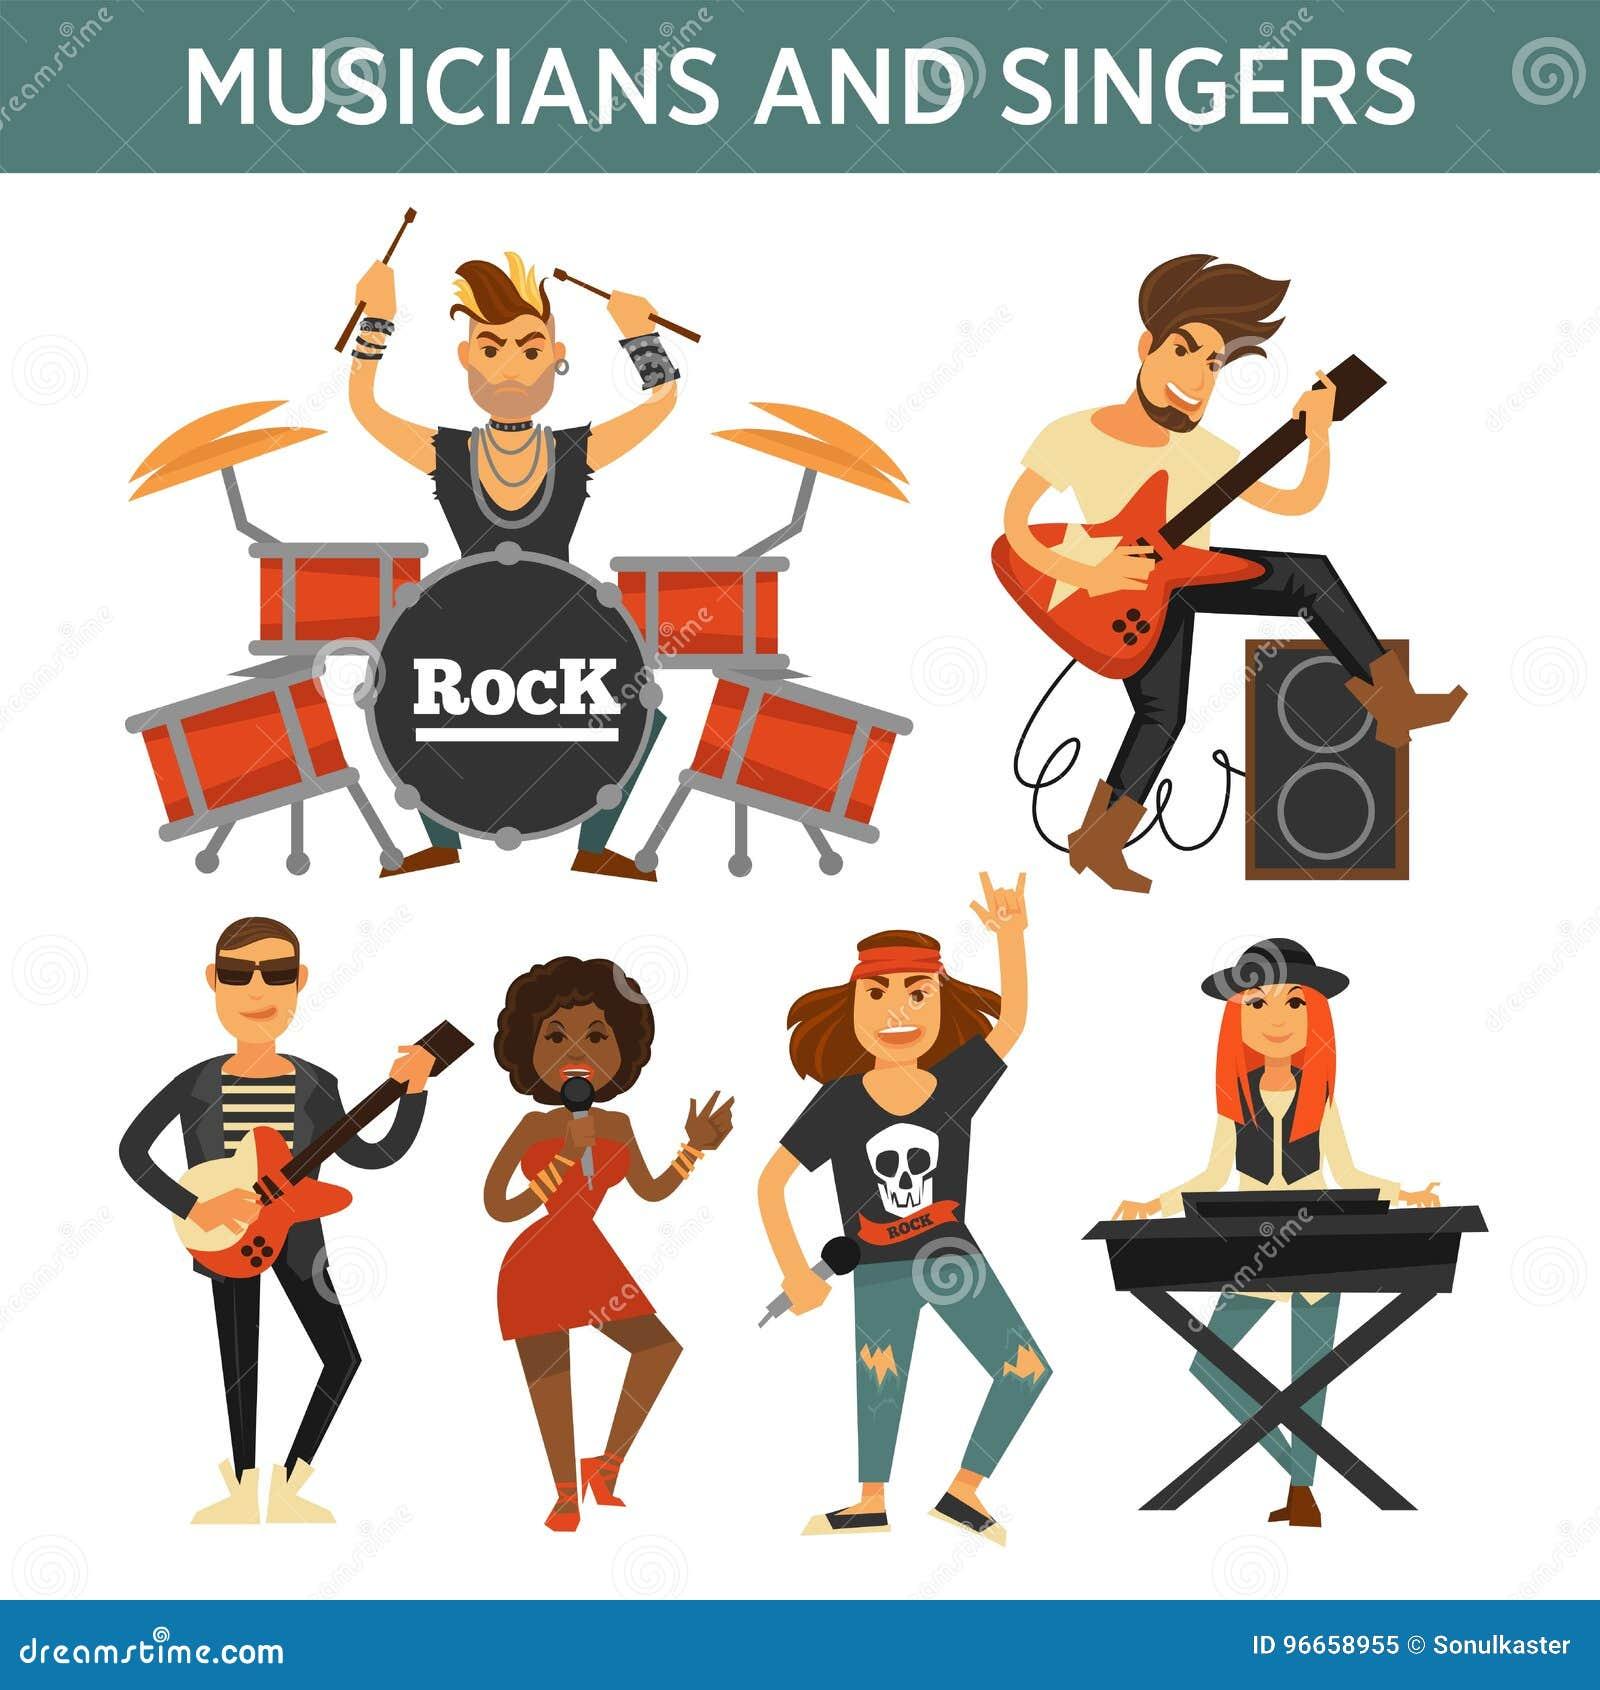 Musikbandsänger, Musiker und Musikinstrumente vector flache Ikonen